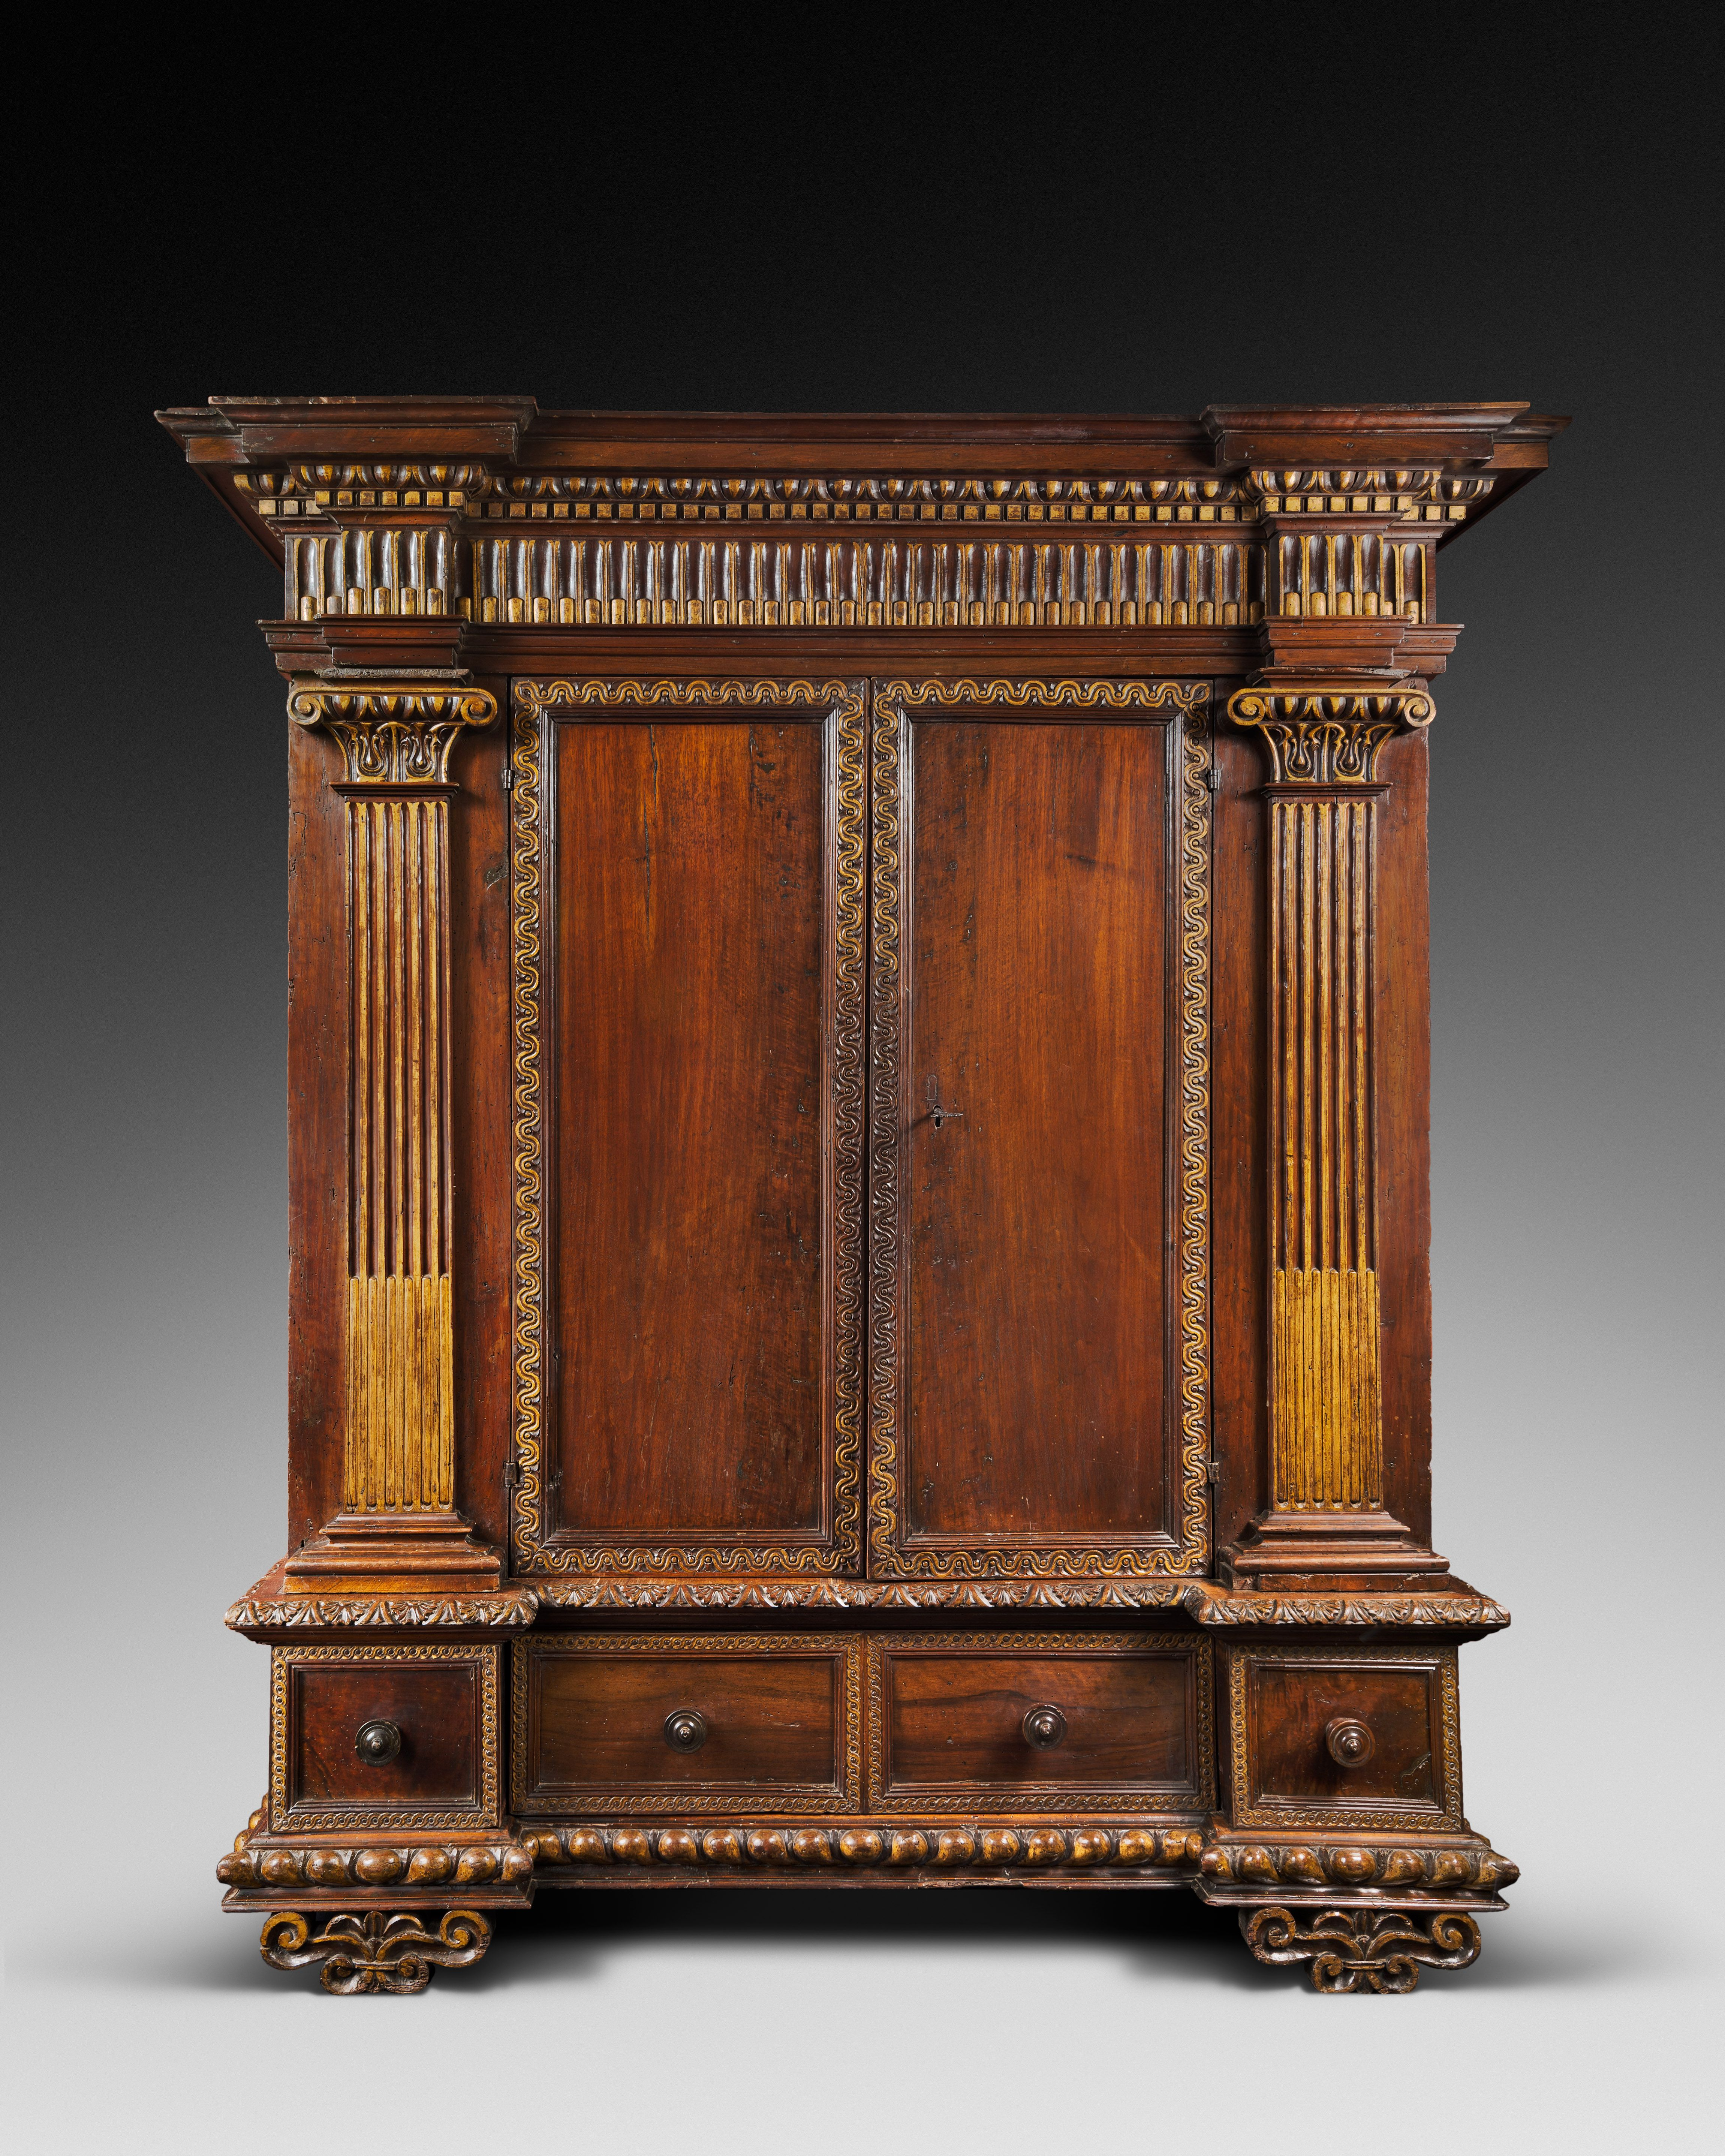 Armoire De Palais Italie Toscane Fin Du 16e Debut Du 17e Siecle Mobilier De Luxe Meuble Baroque Renaissance Italienne